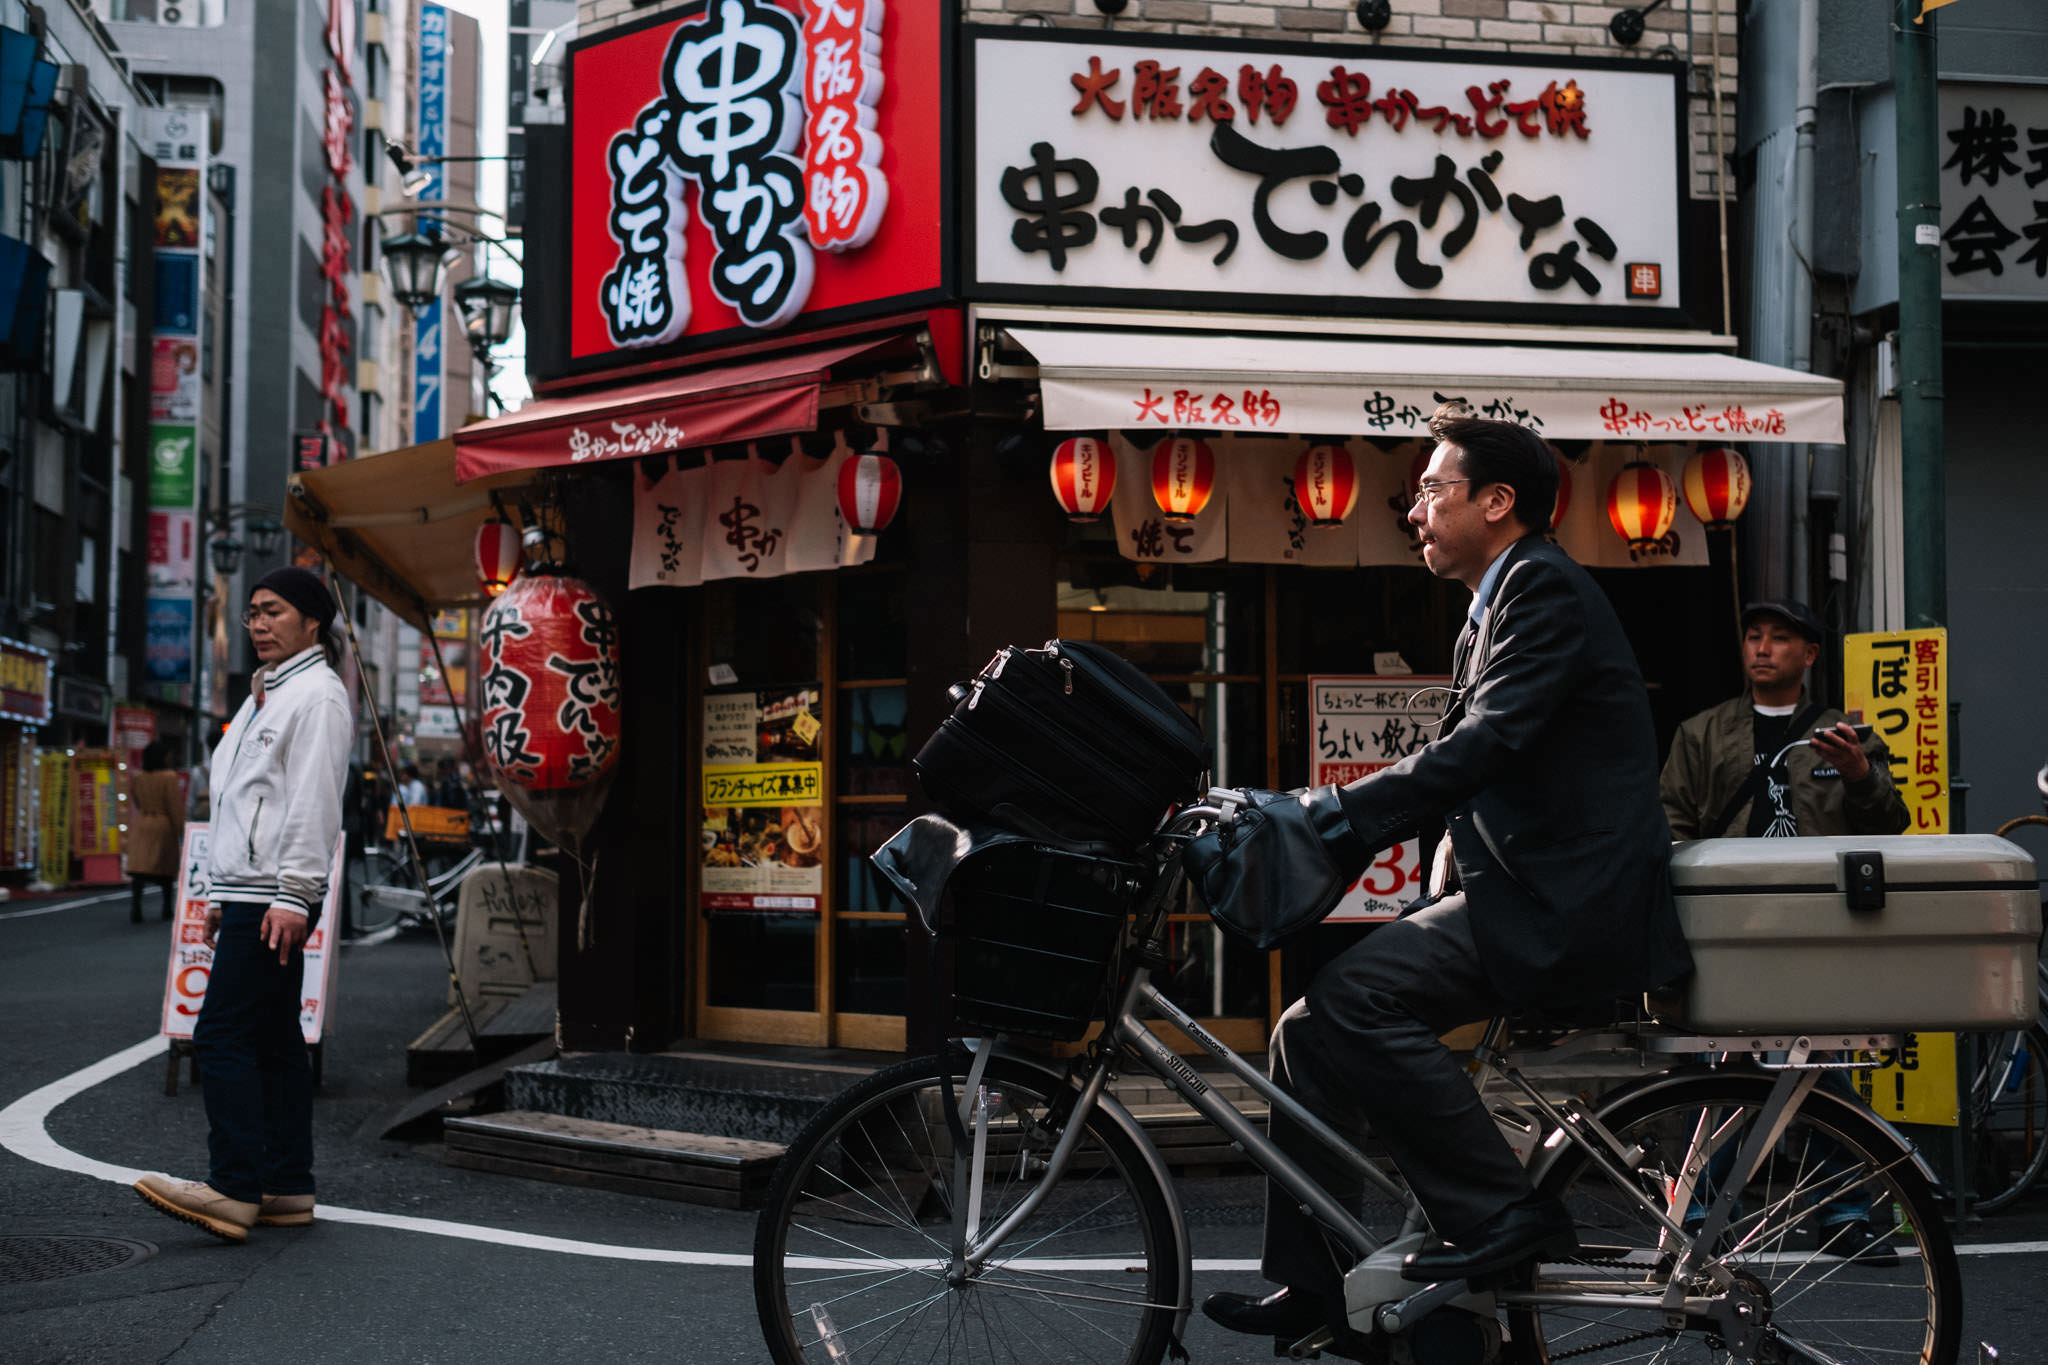 chris_eberhardt_japan_travel_reise_nippon-75.jpg